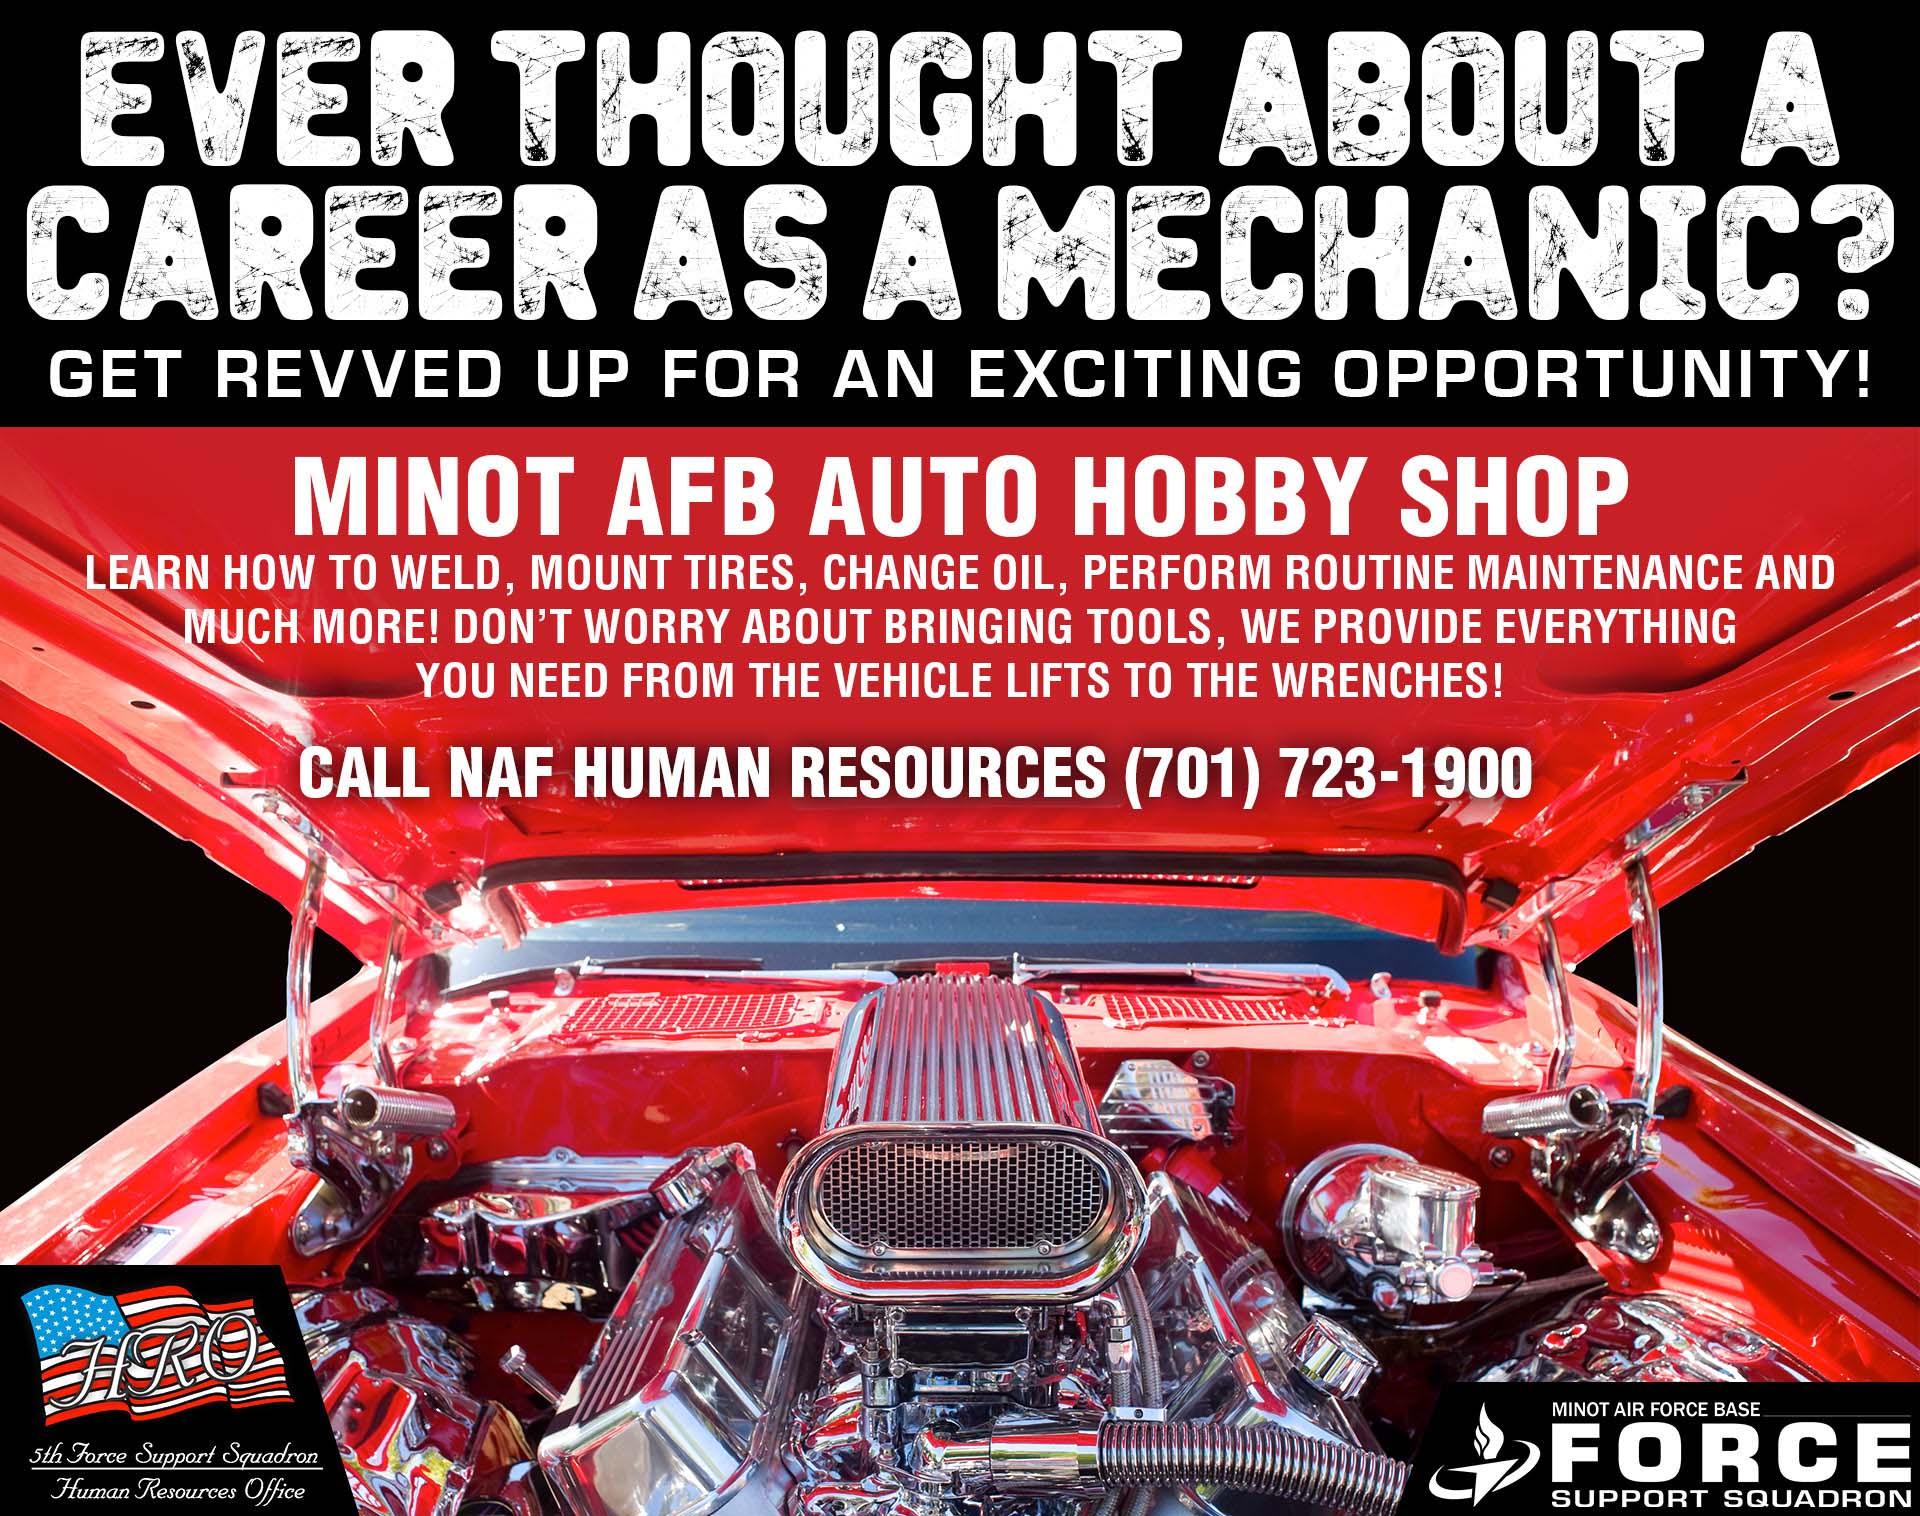 NAF HR - Now Hiring - Auto Hobby